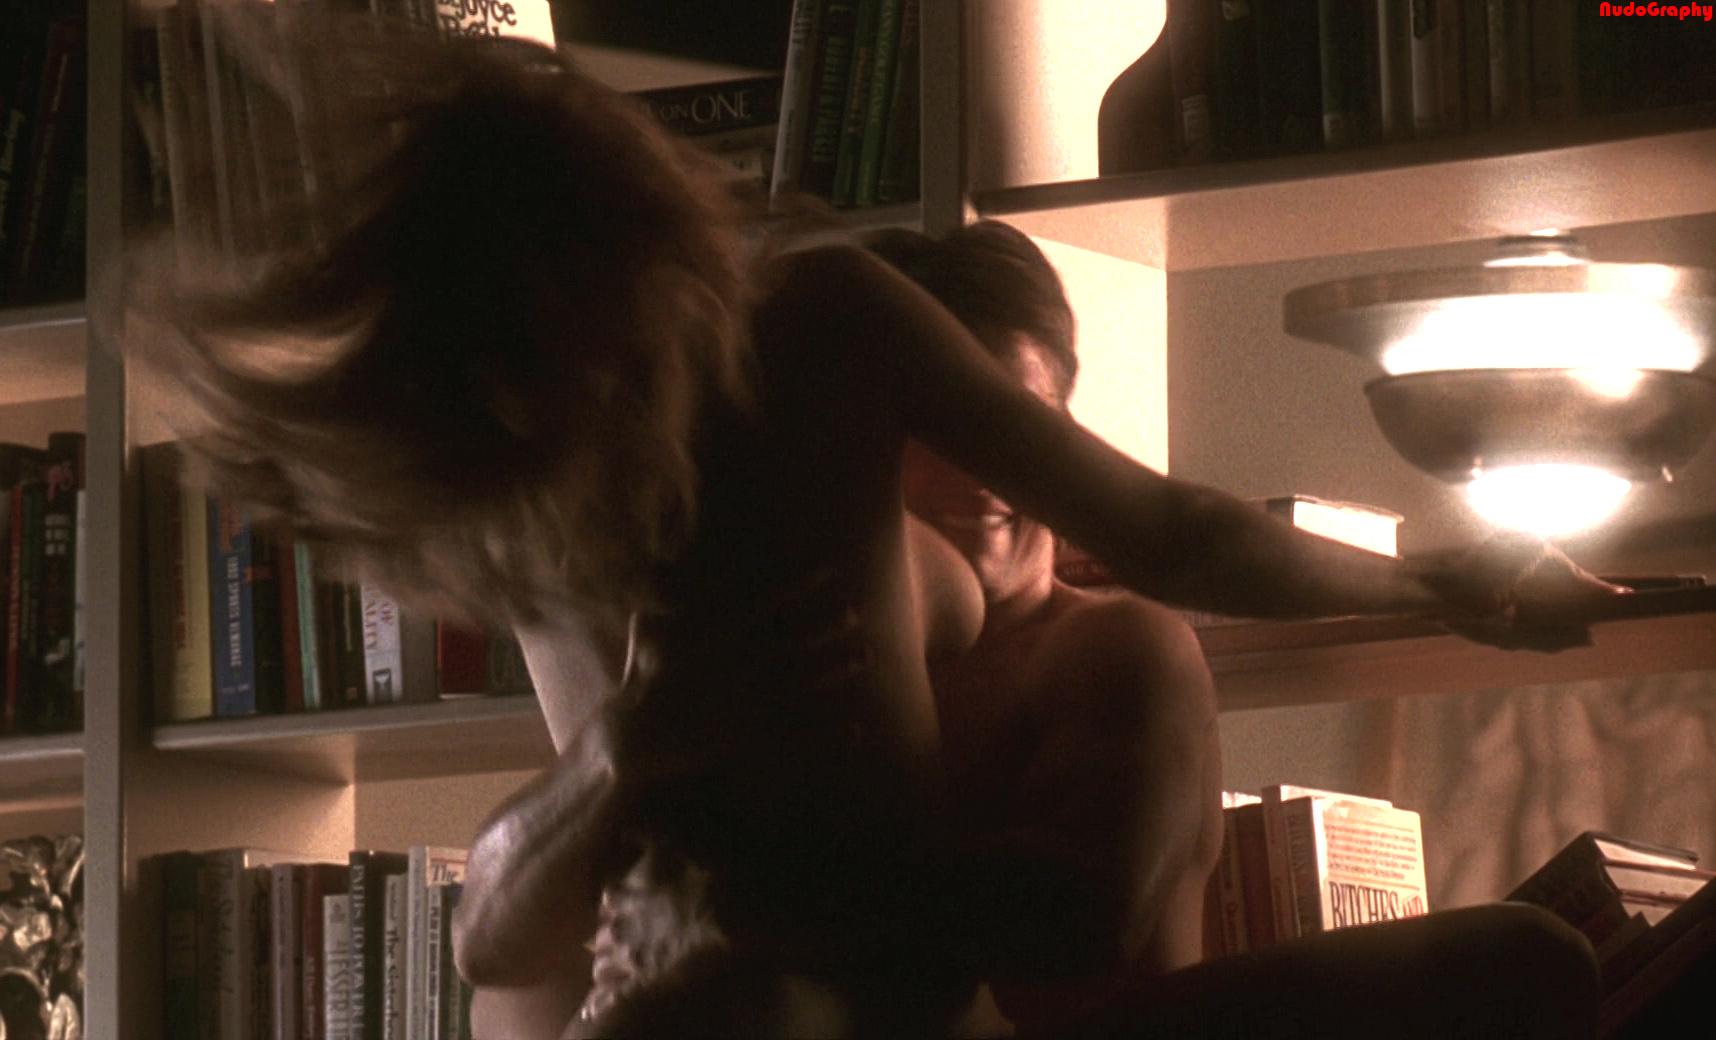 Jerry Maguire Nude Scenes